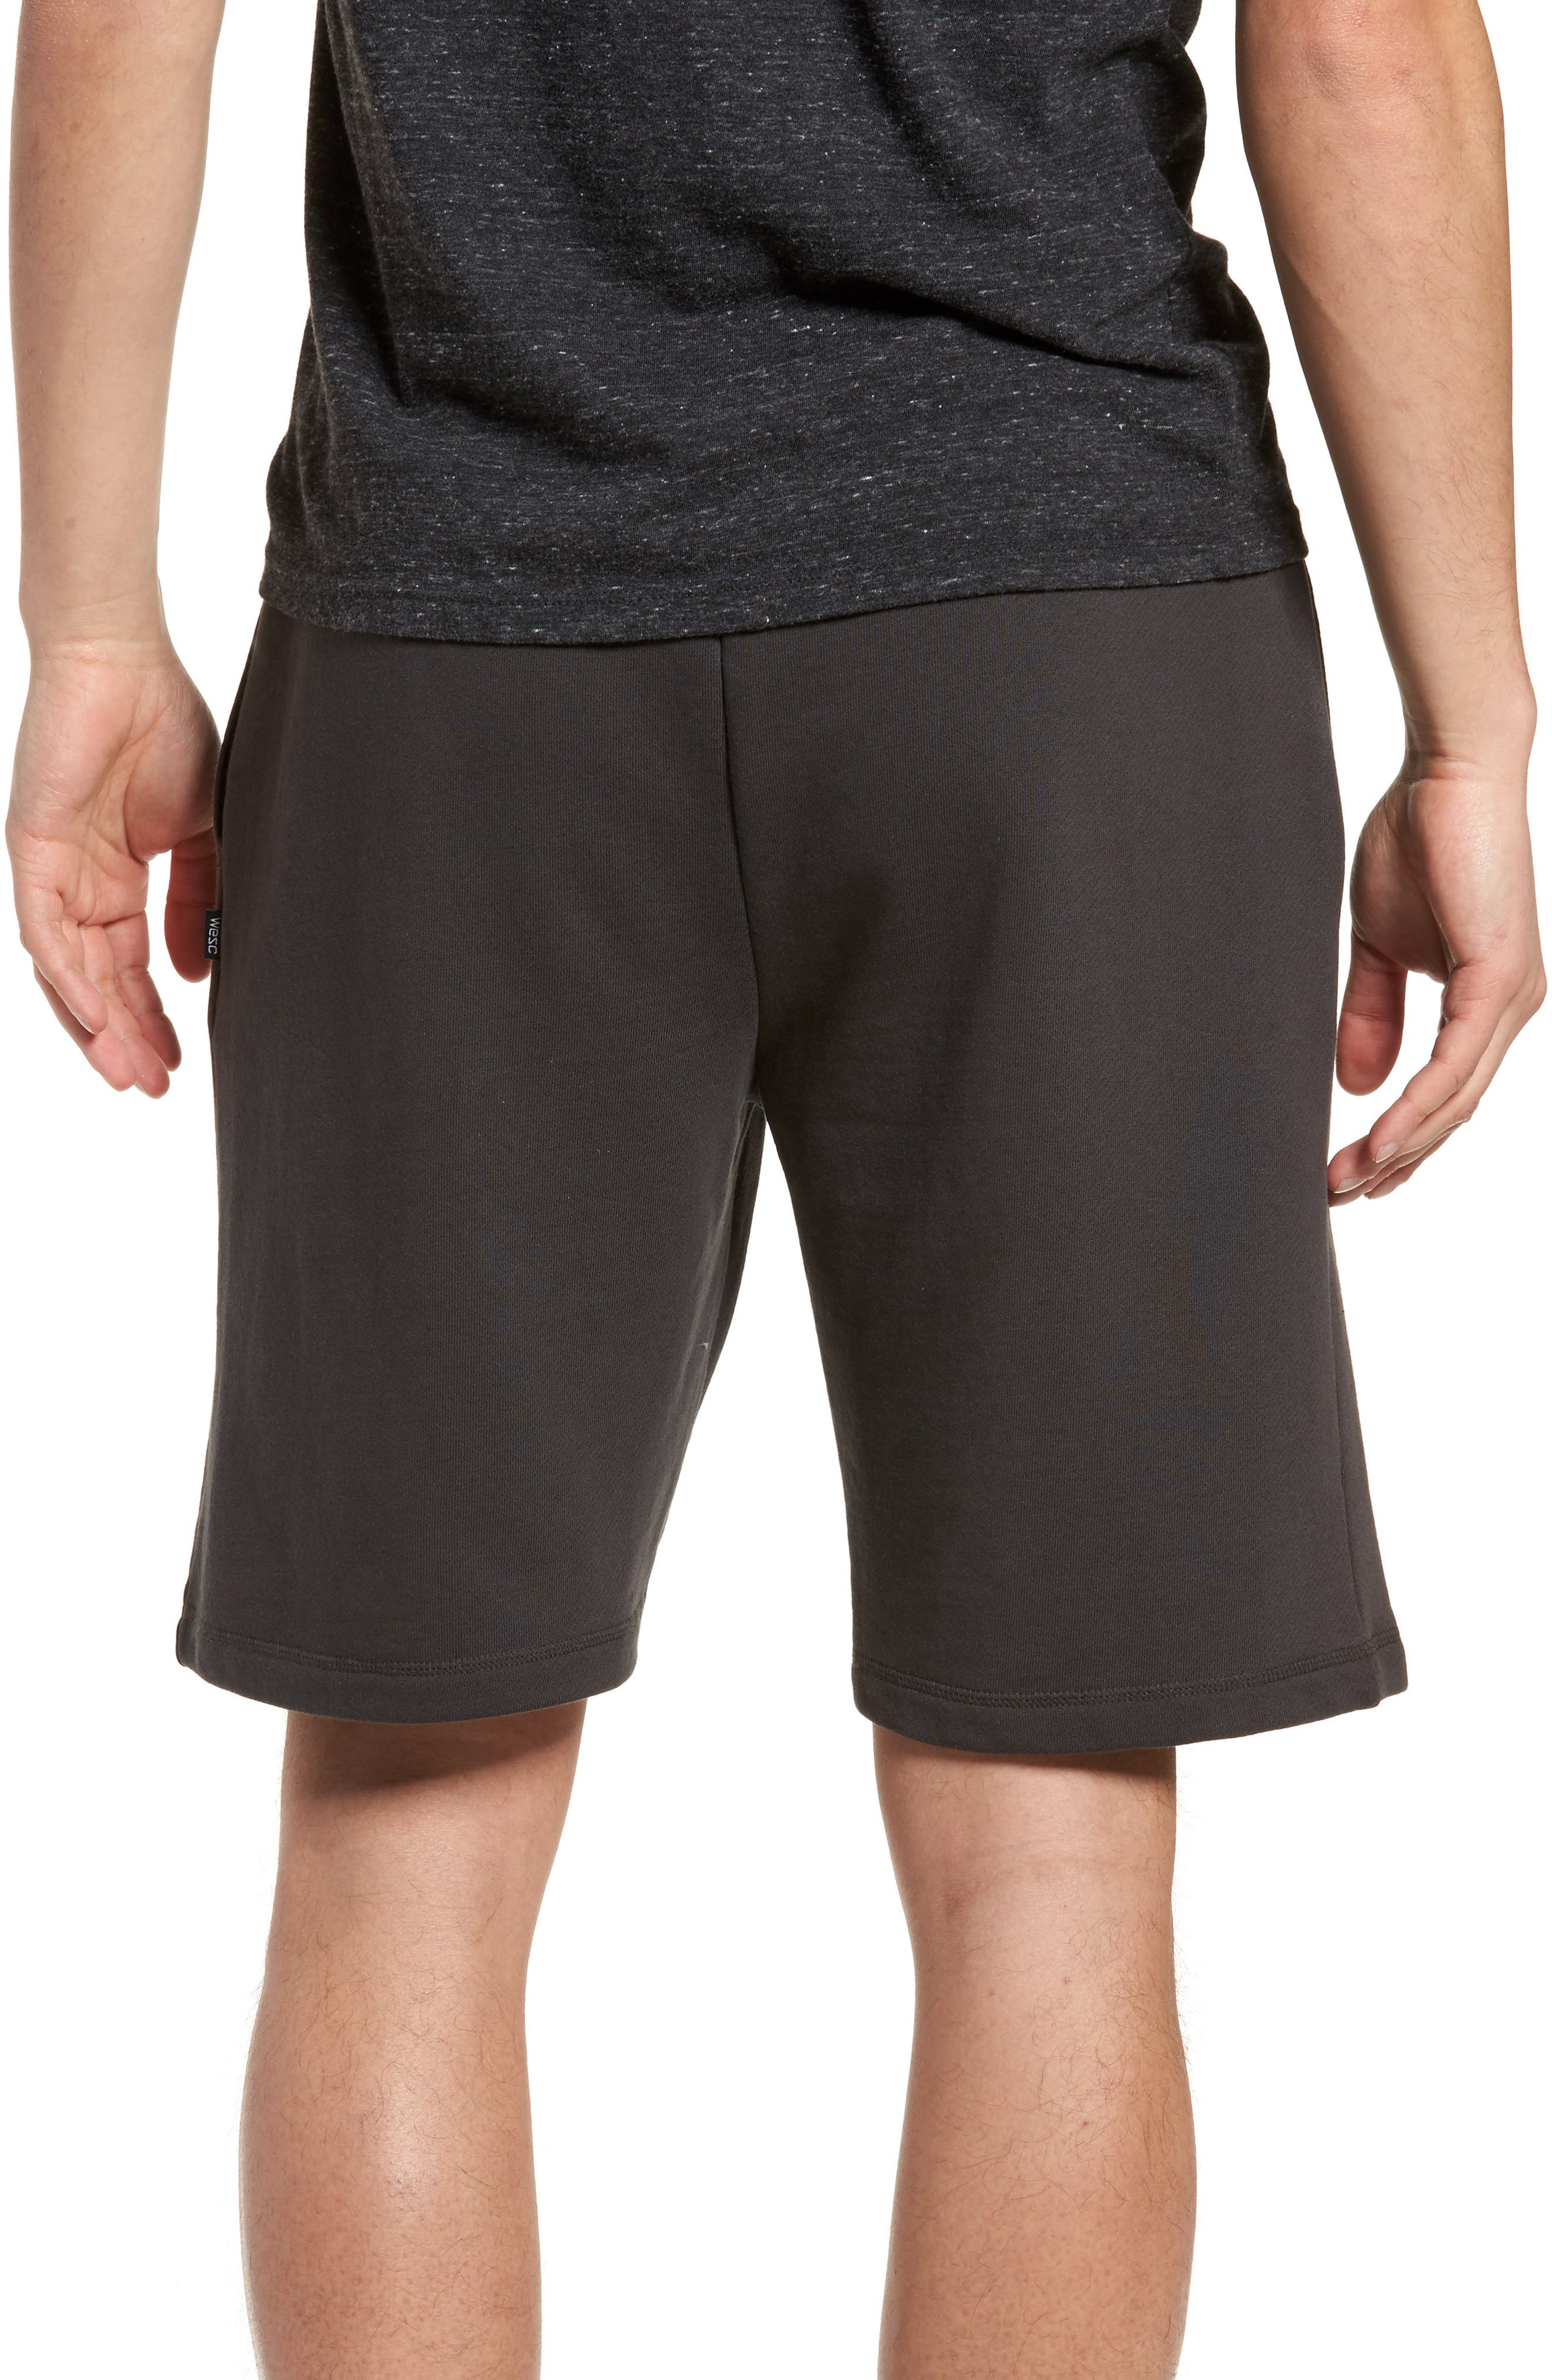 Marty Fleece Shorts,                             Alternate thumbnail 2, color,